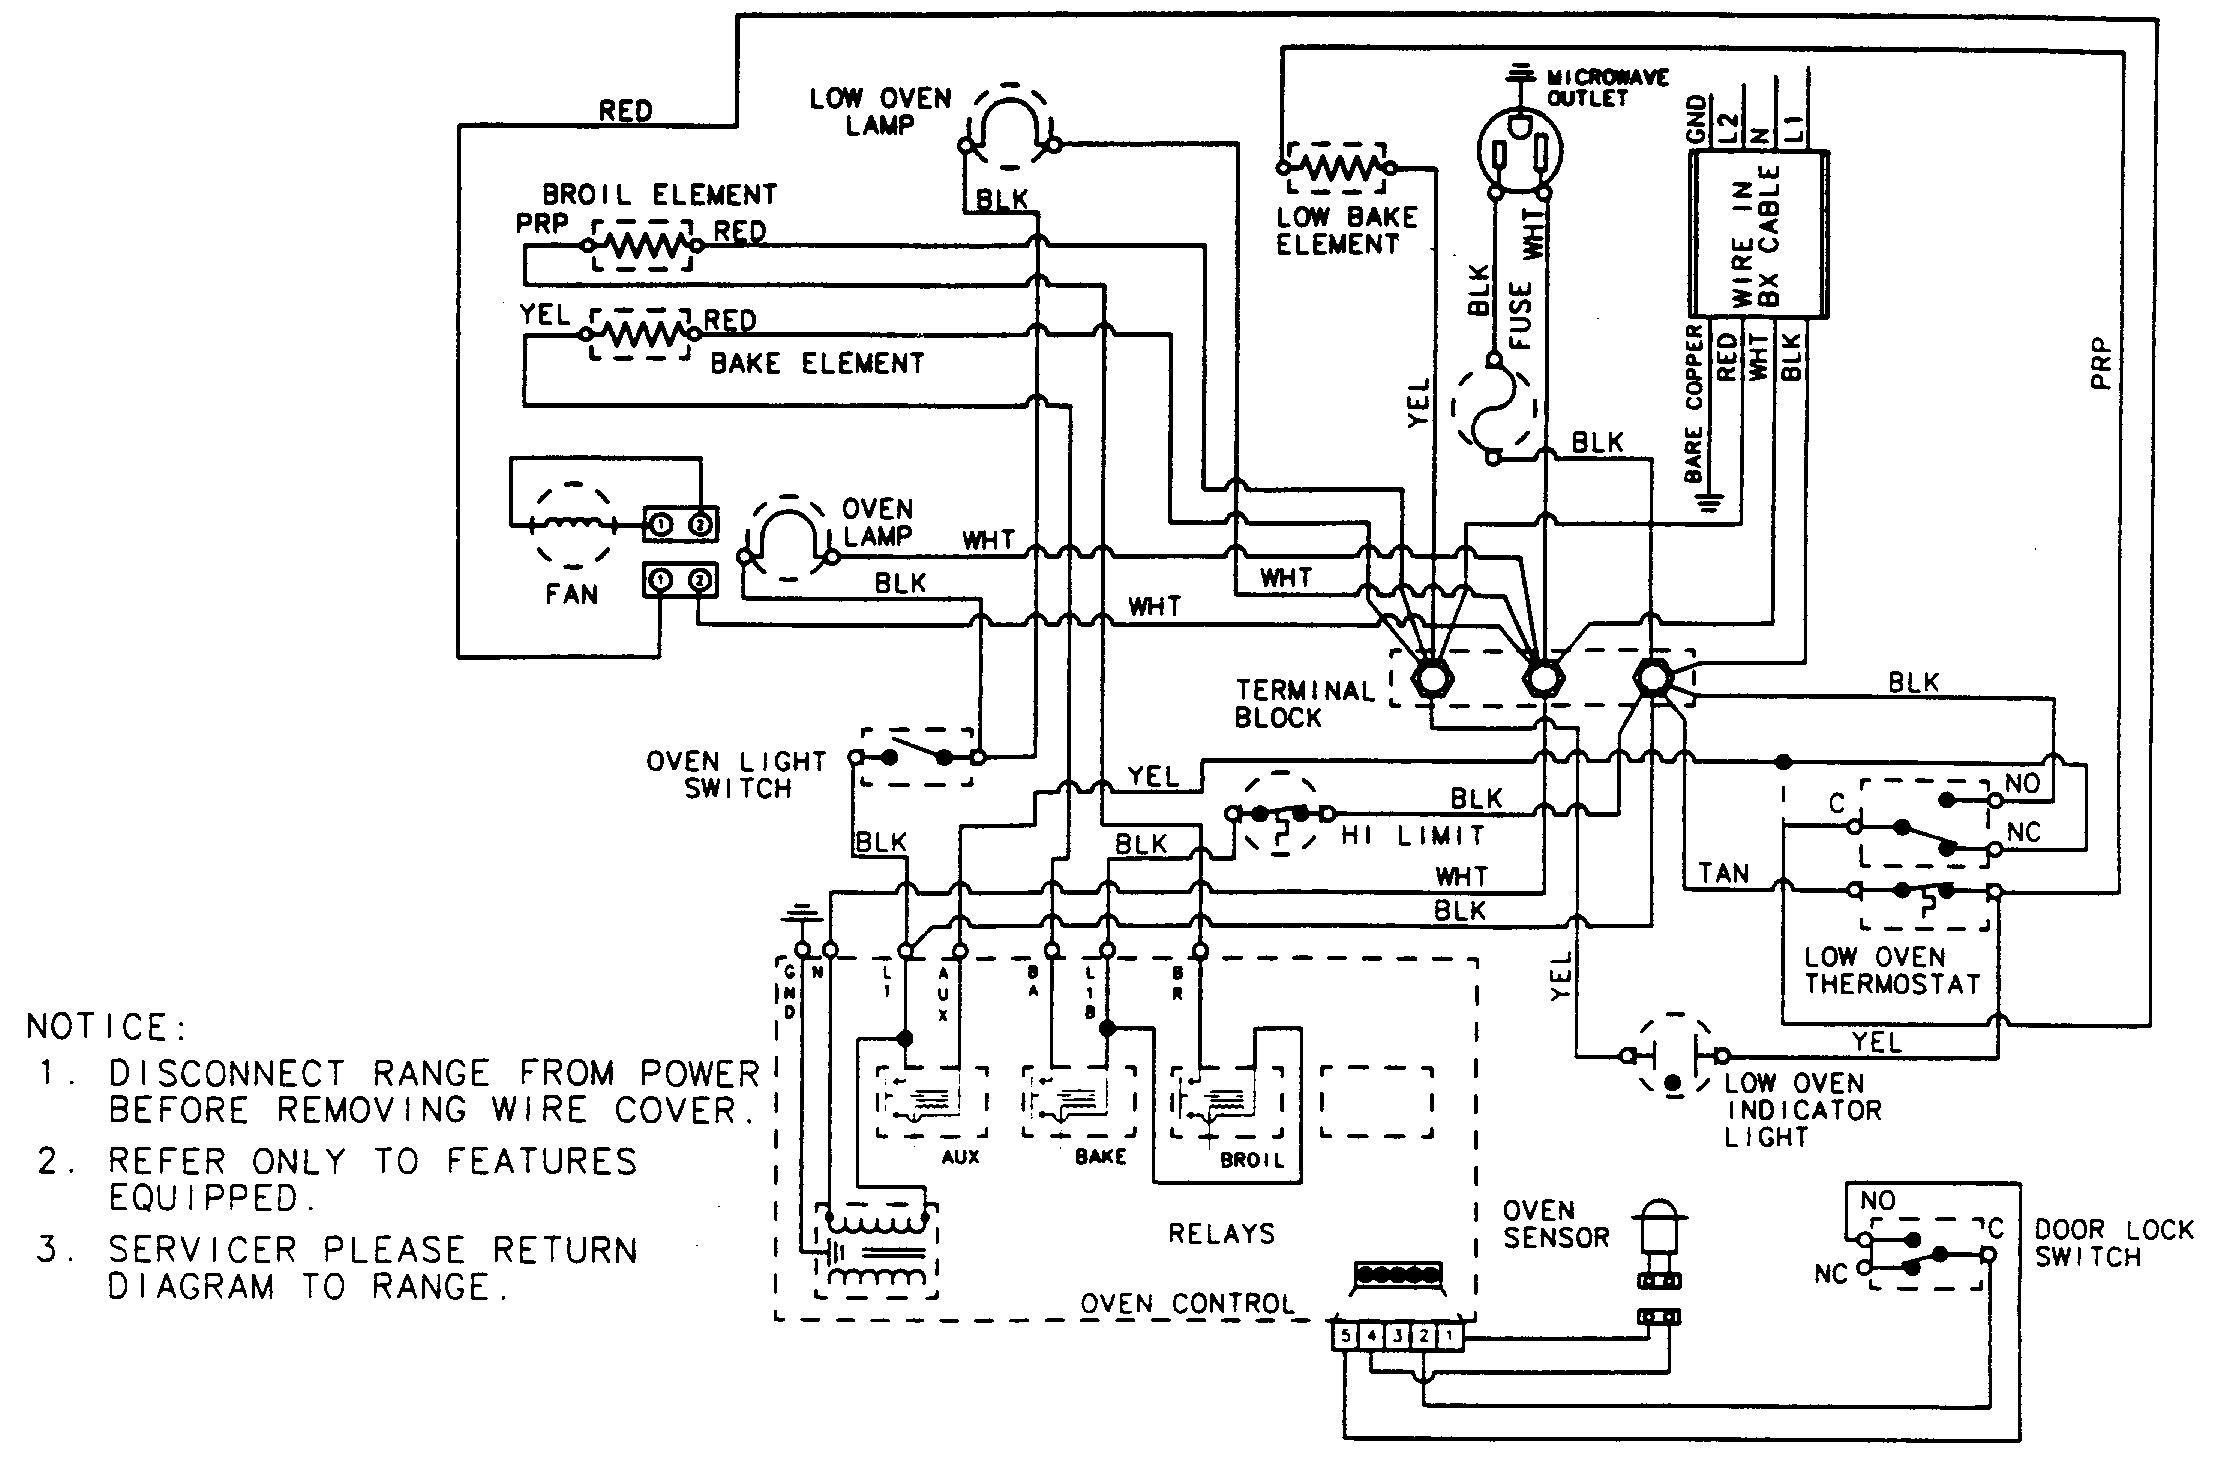 [SCHEMATICS_4NL]  YD_9777] Maytag Double Oven Wiring Diagram Wiring Diagram | Wiring Diagram For Ge Oven Element |  | Indi Sapebe Mohammedshrine Librar Wiring 101